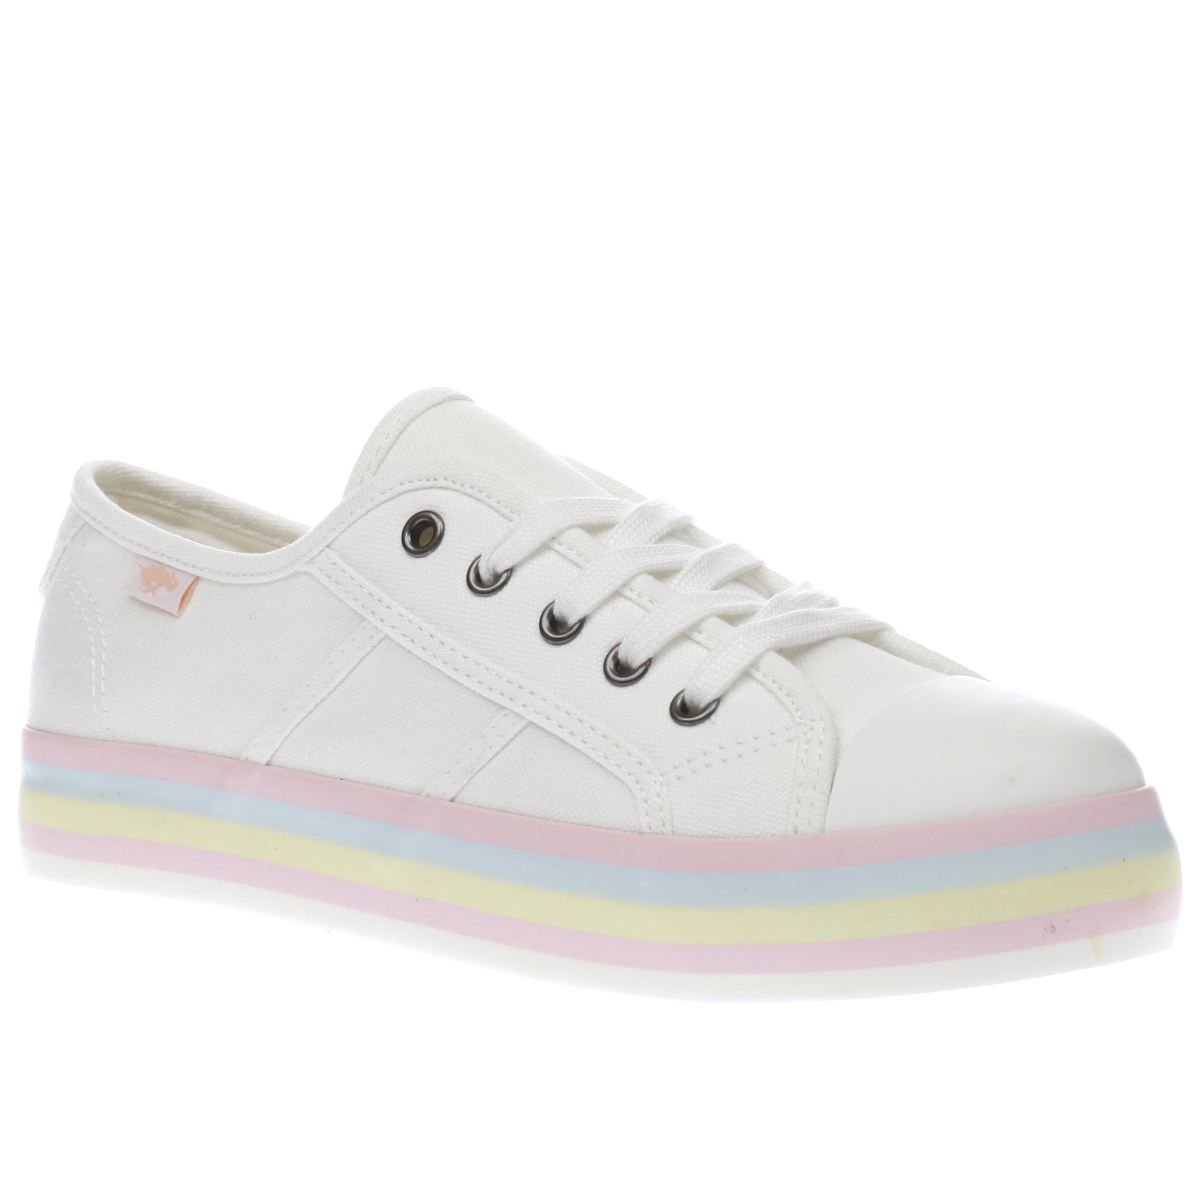 Rainbow Dogs Women¡s Casual Shoes Sneakers Footwear Slip On Low Top Original